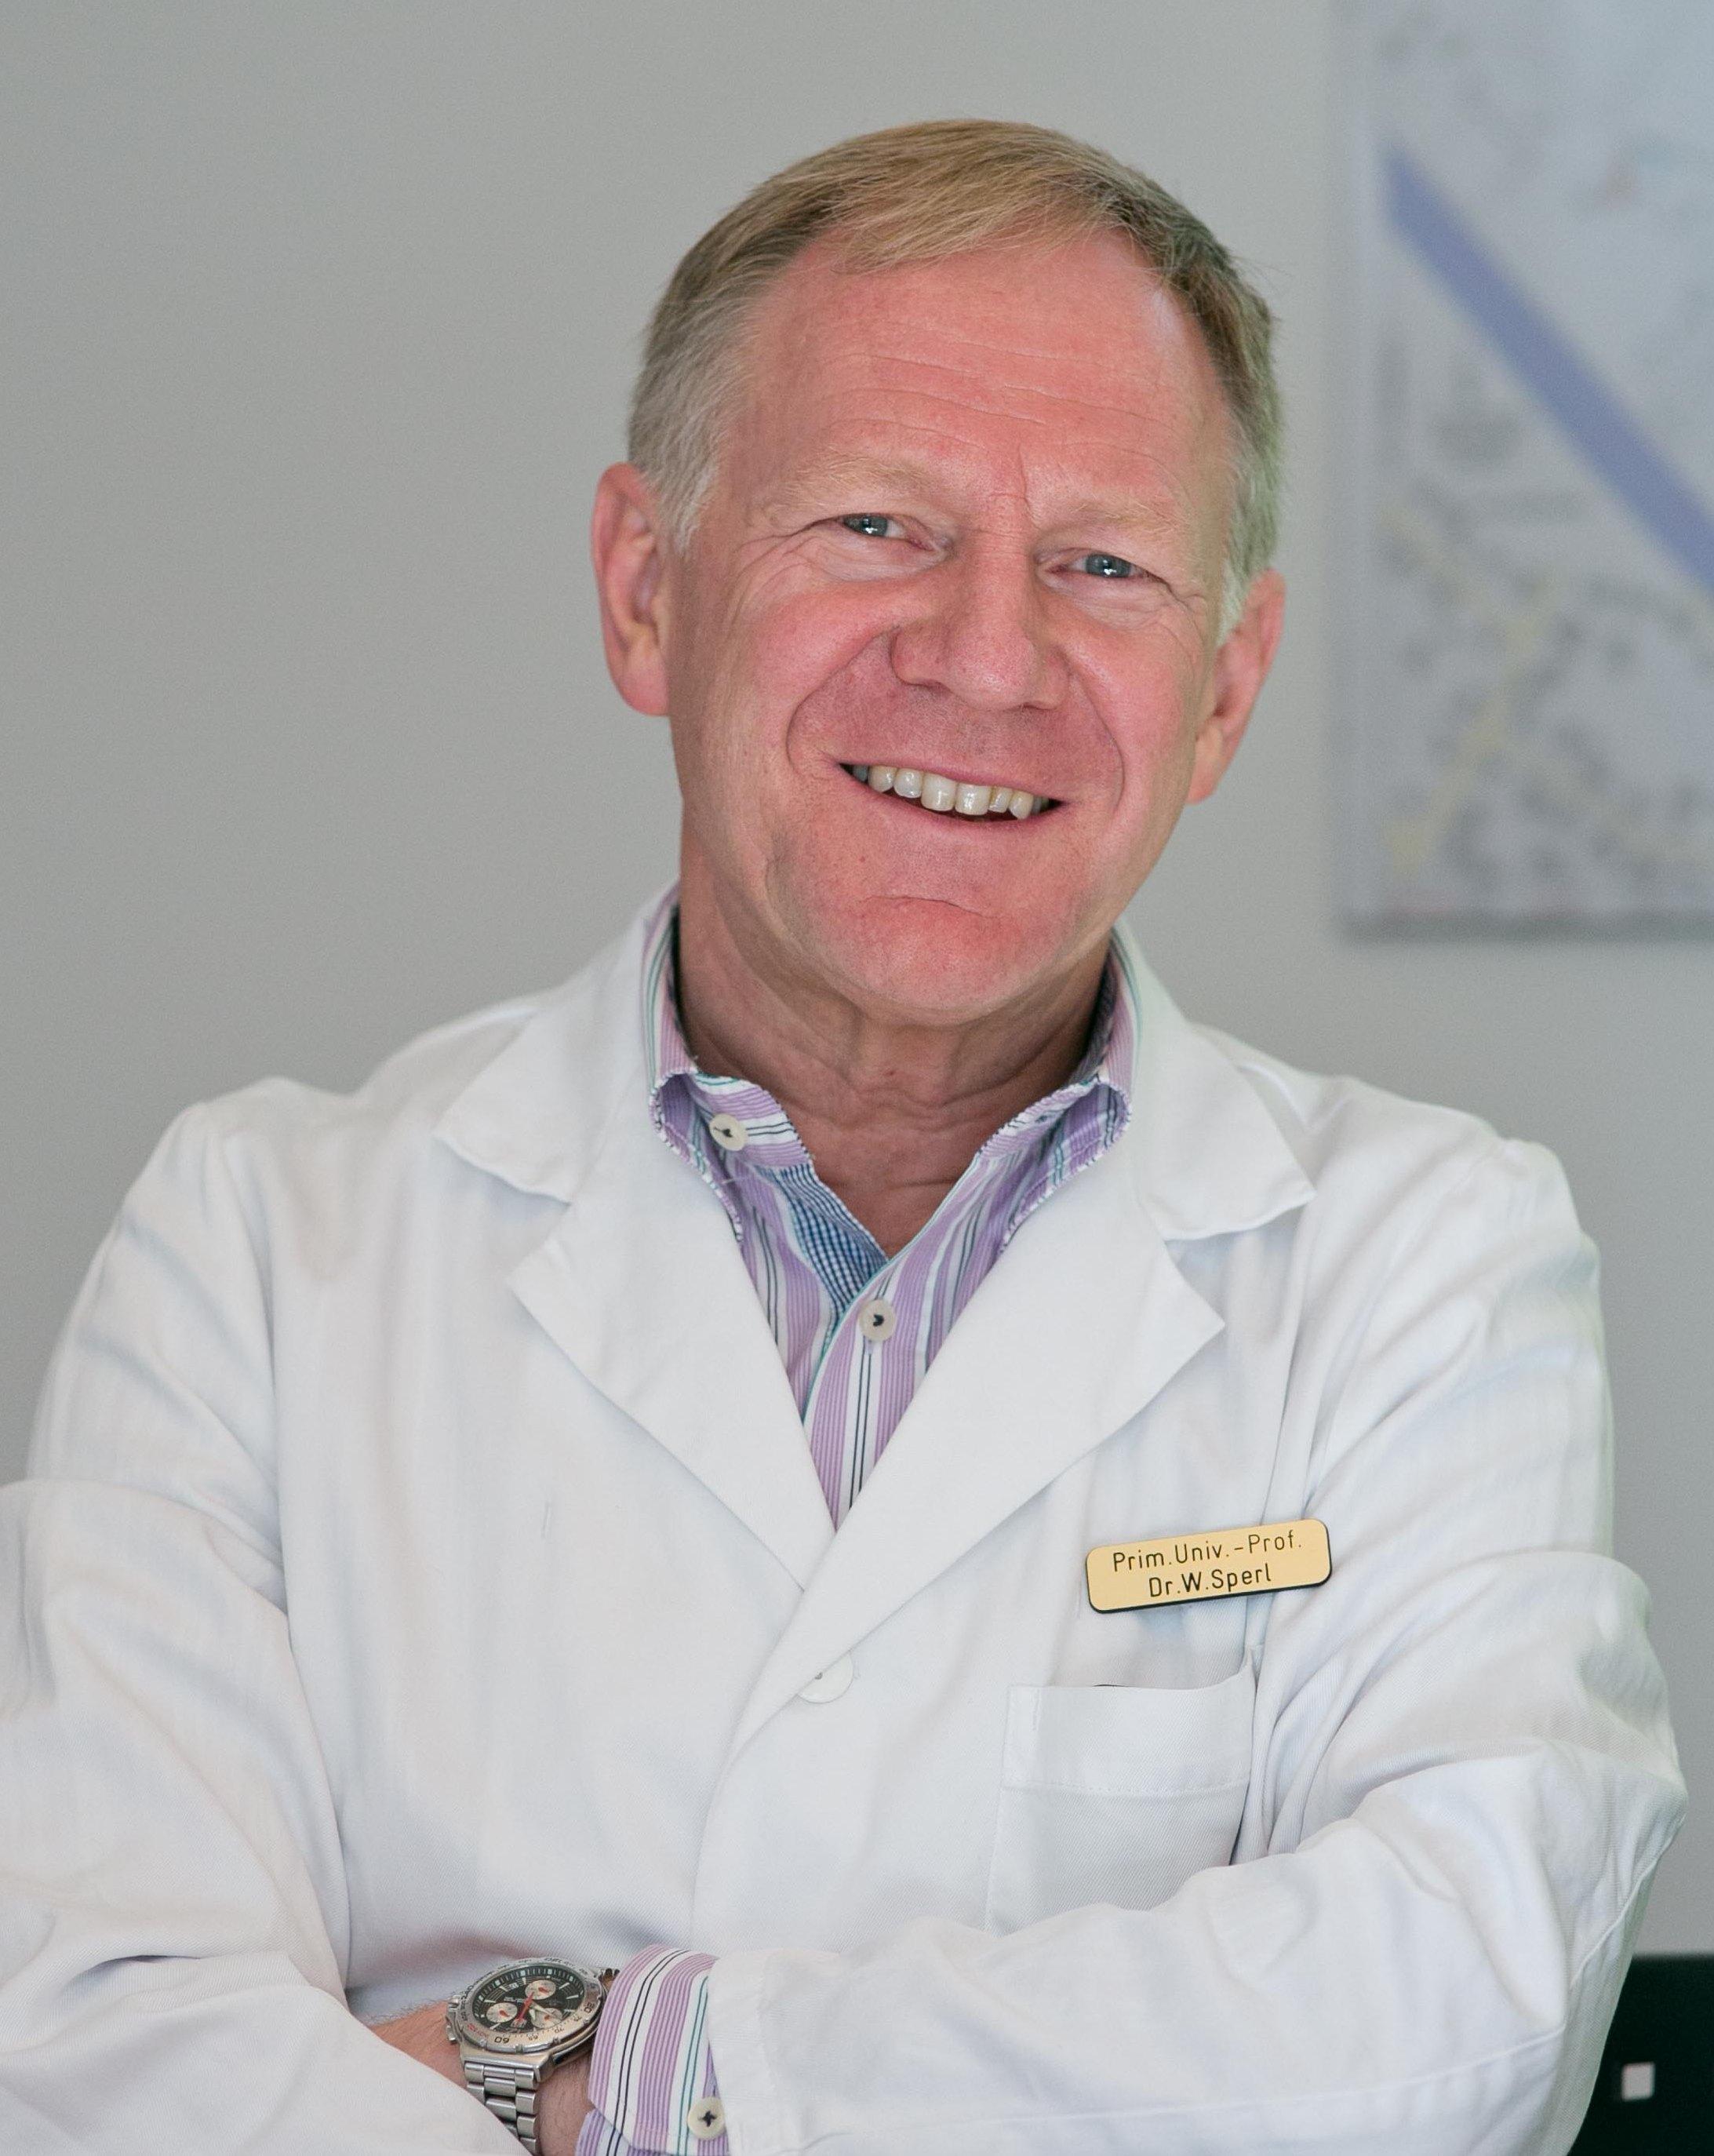 Prim. Univ. Prof. Dr. W. Sperl